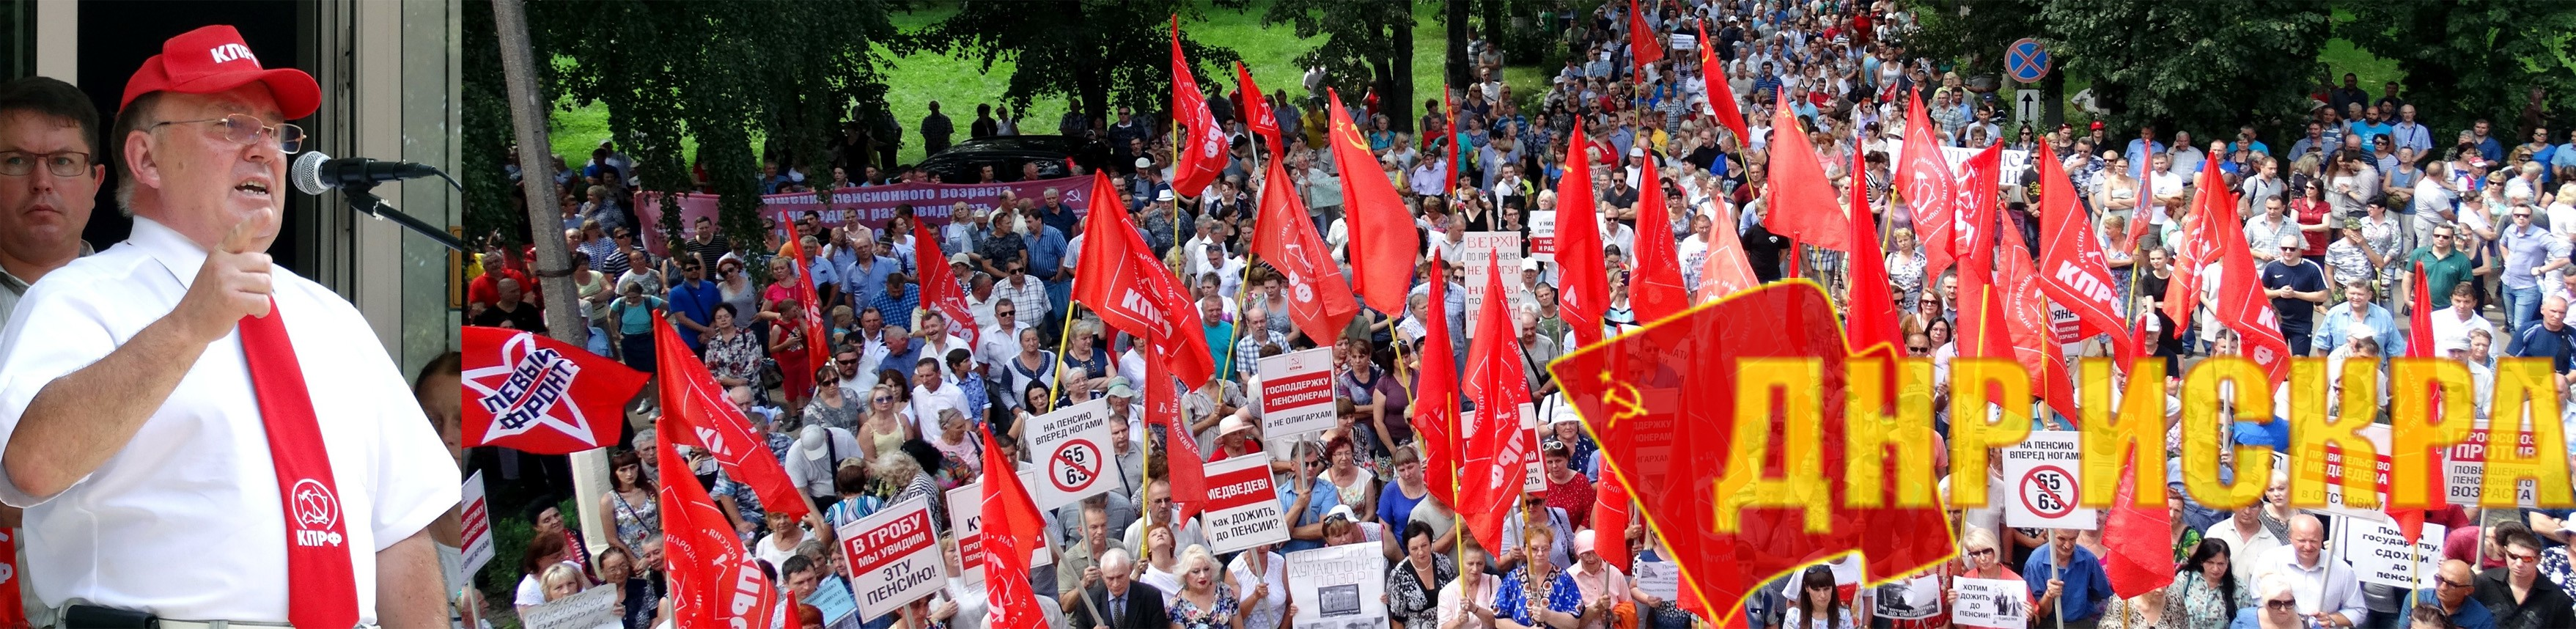 Митинг КПРФ в Курске